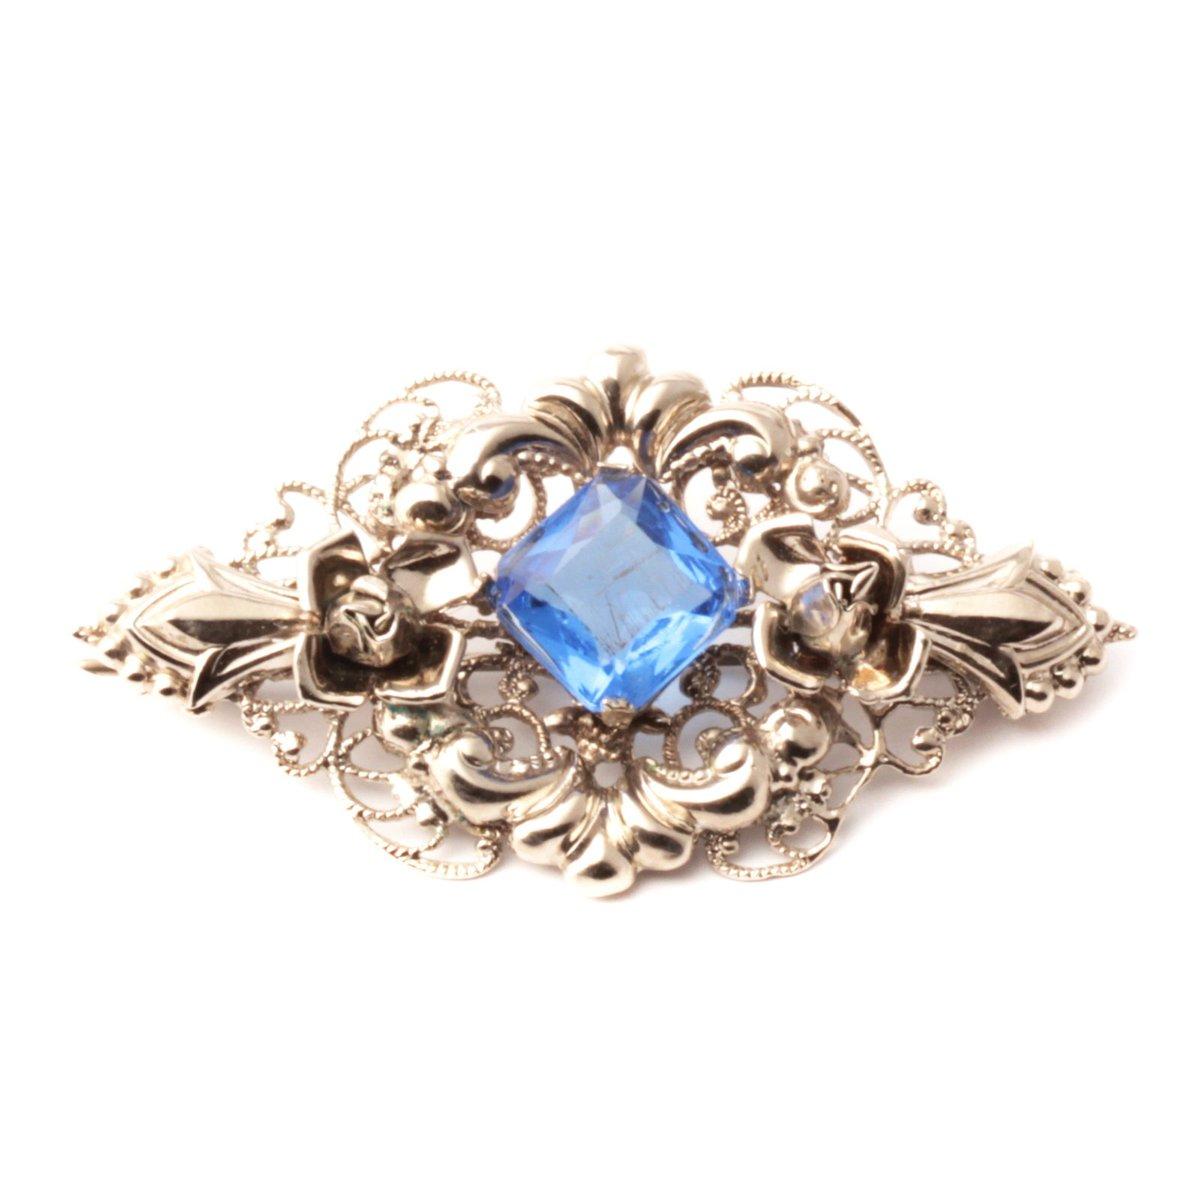 0083f5c4e #etsy shop: Vintage Art Deco Czech blue square glass rhinestone floral  filigree silver pin brooch https://etsy.me/2QOjuYF #jewelry #brooch #silver  #blue ...